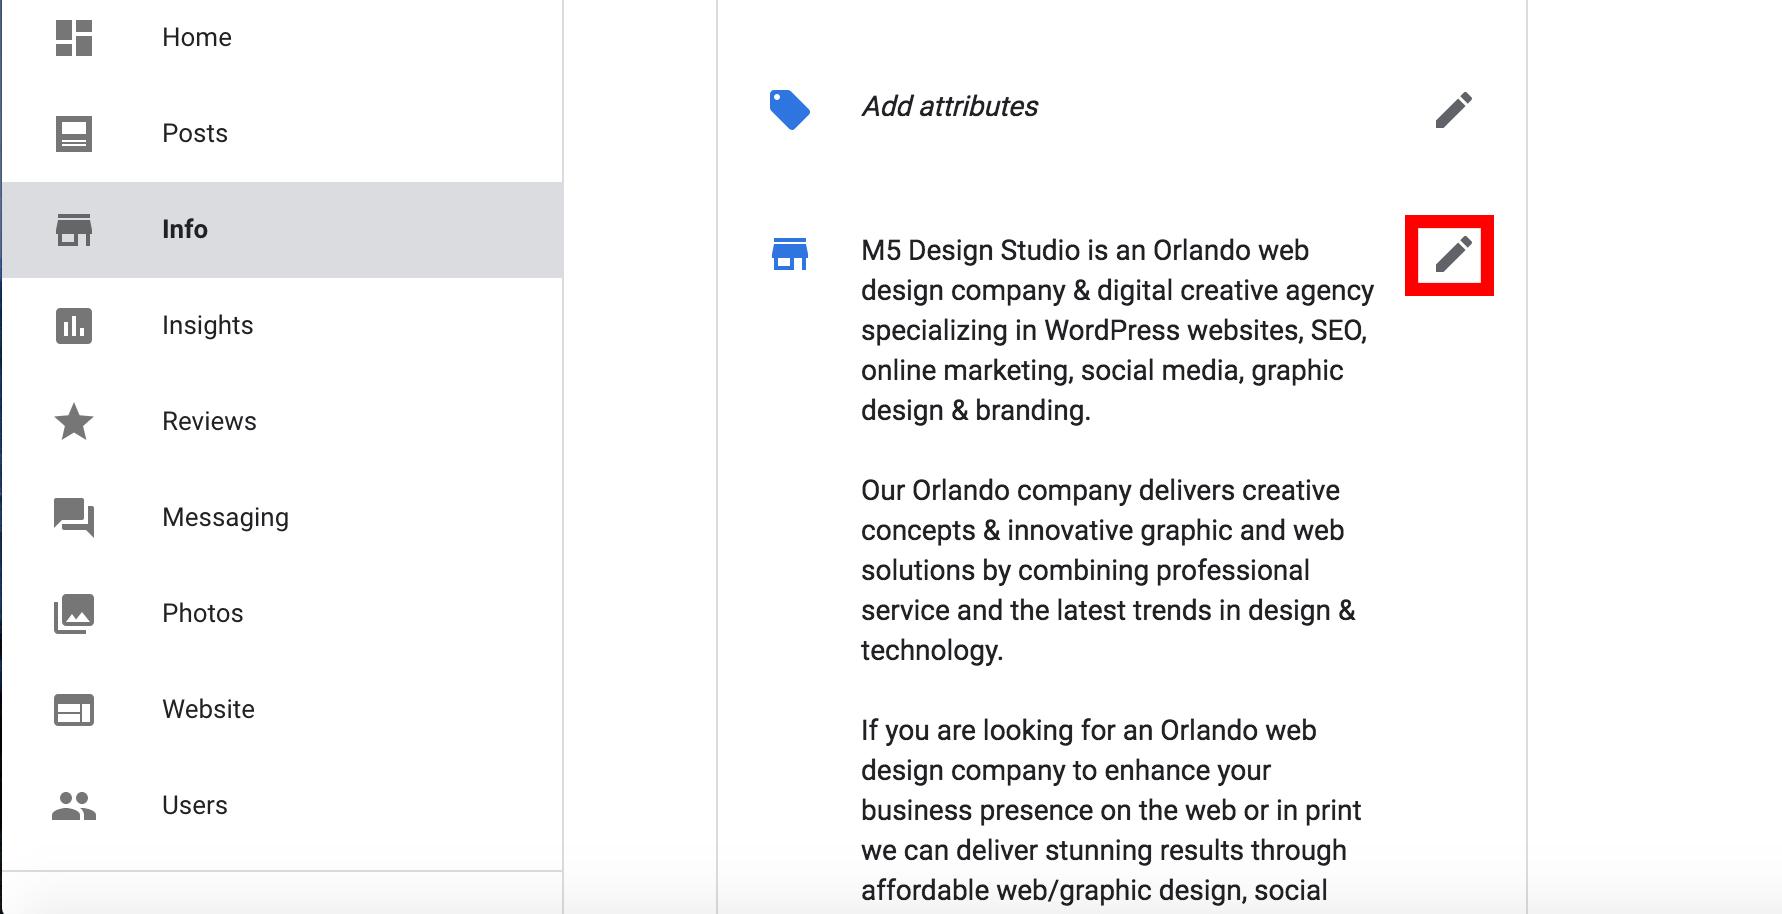 Orlando SEO Design Company